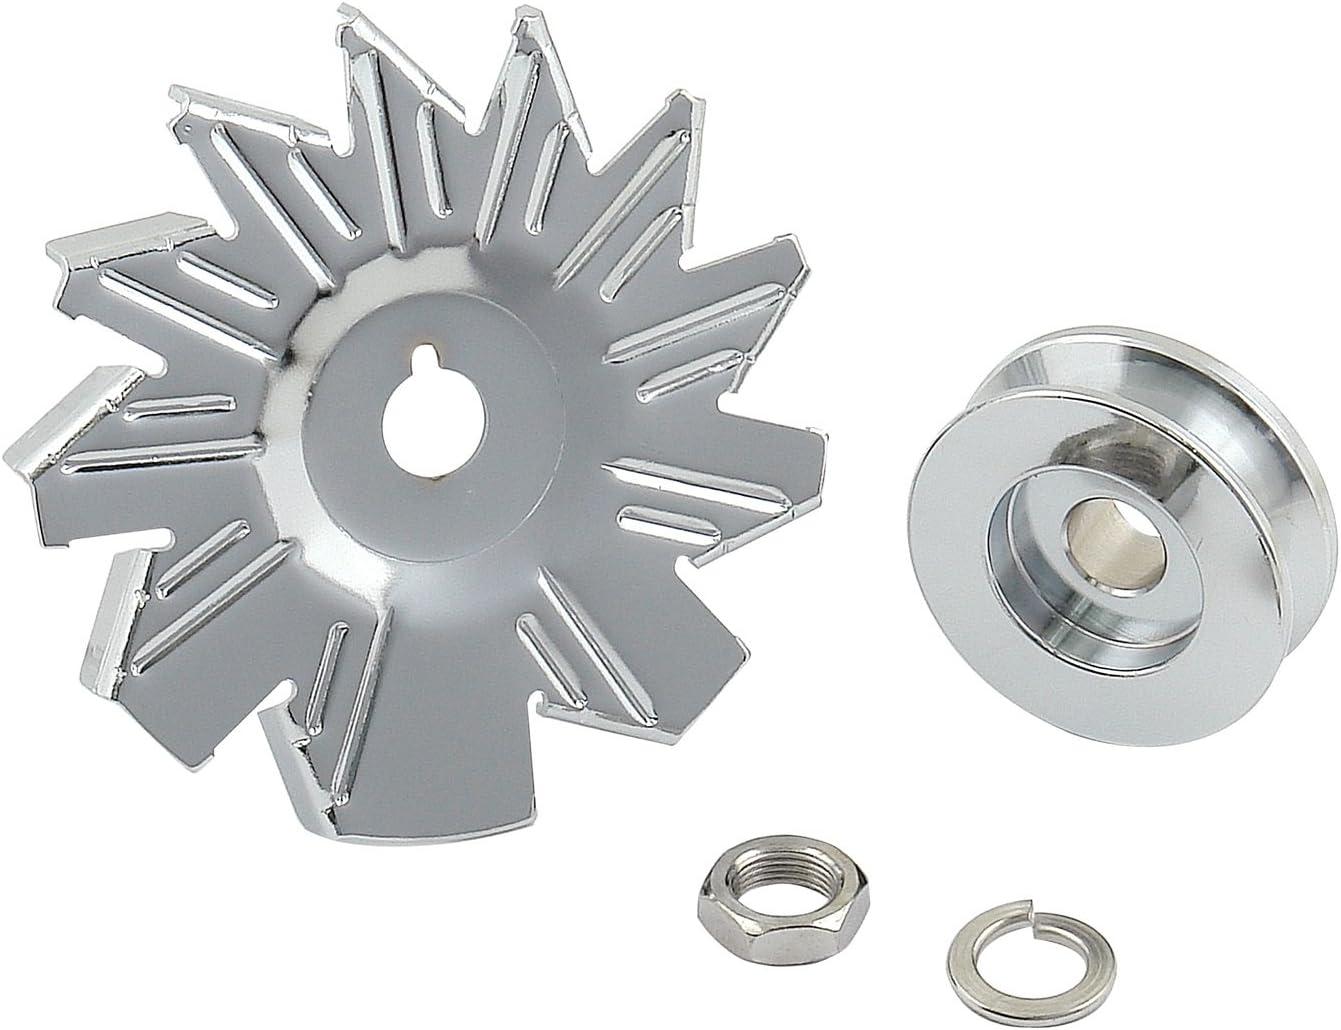 Partomotive Front Hood Latch Lock Bracket Steel Fits 07-12 Sentra Sedan NI1234118 65601ET000